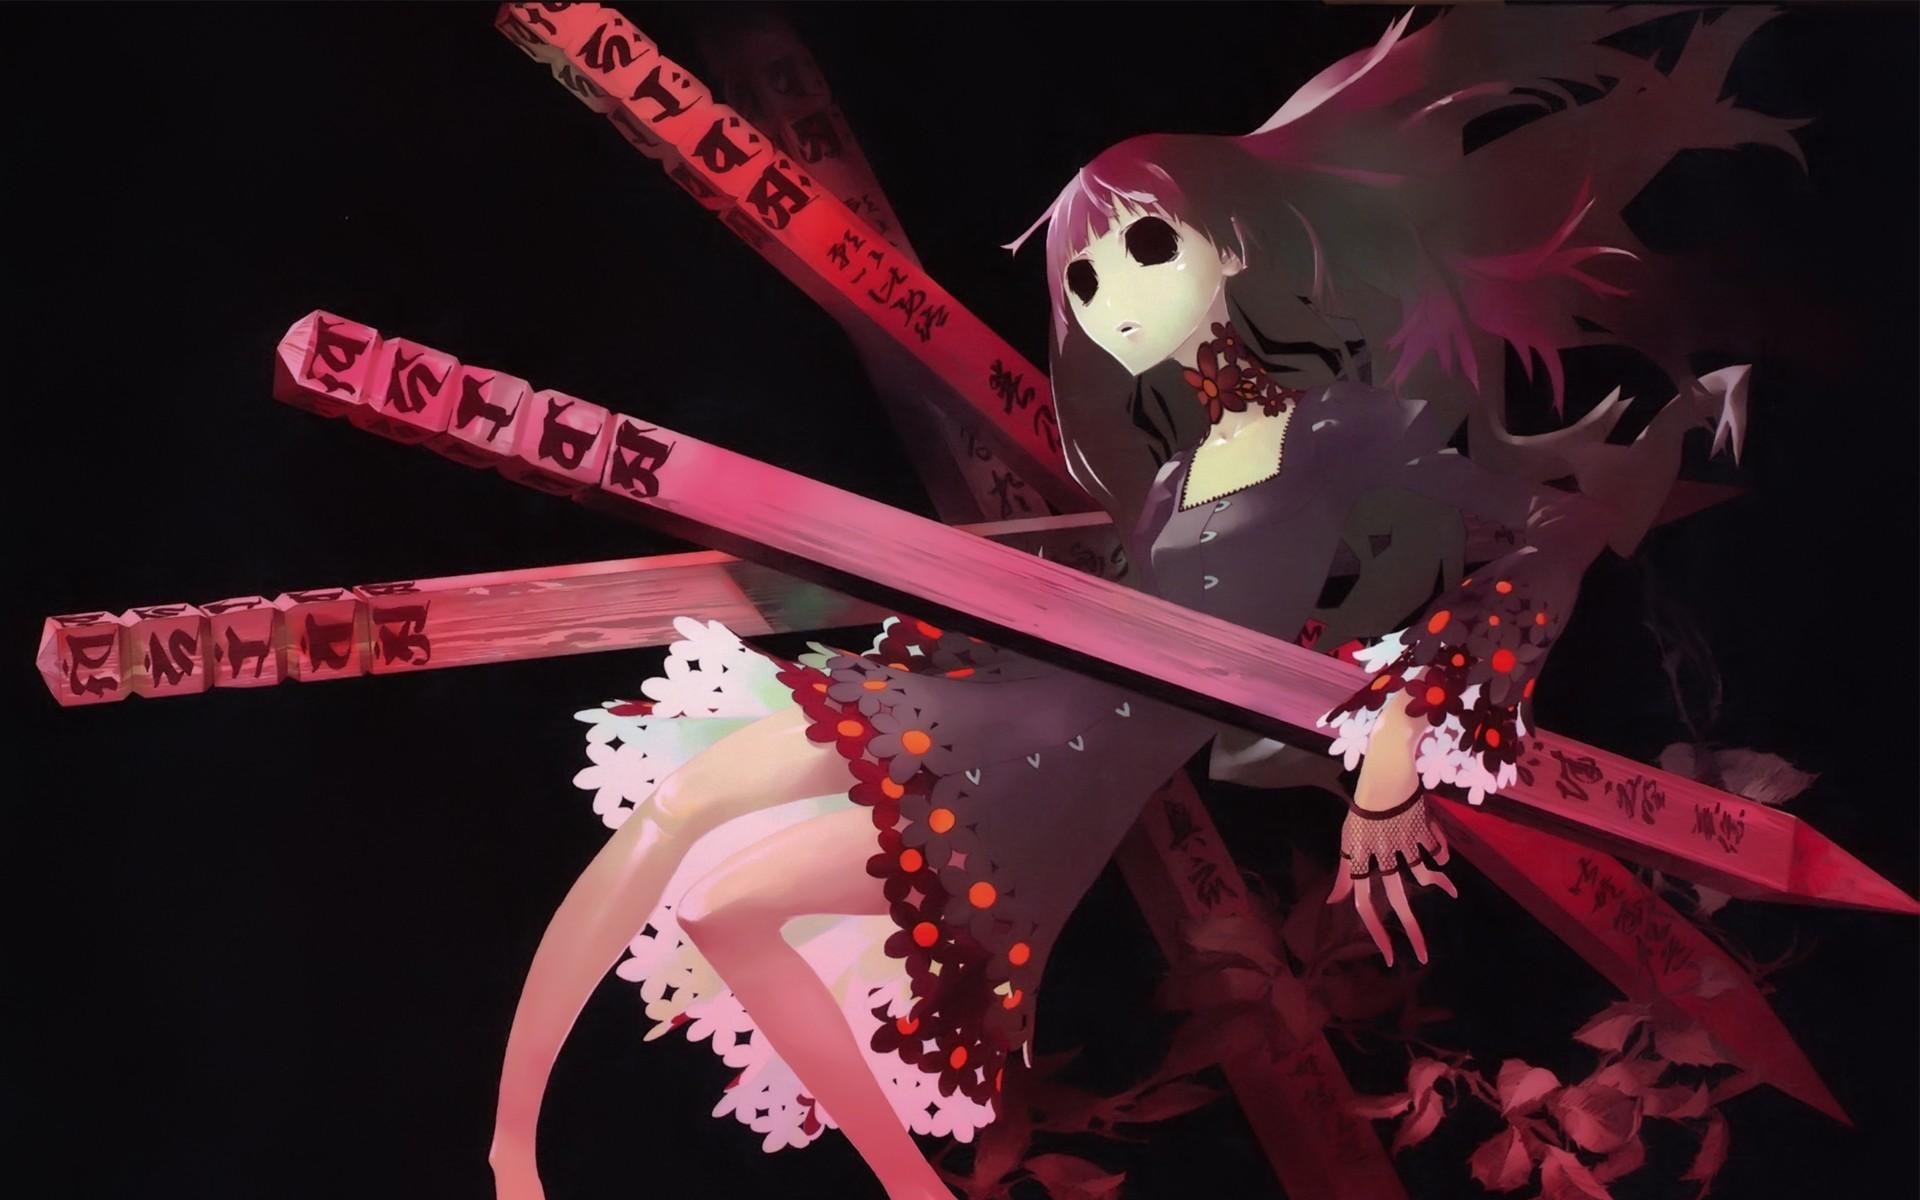 Creepy Cute Anime Girl Creepy flowers wallpaper